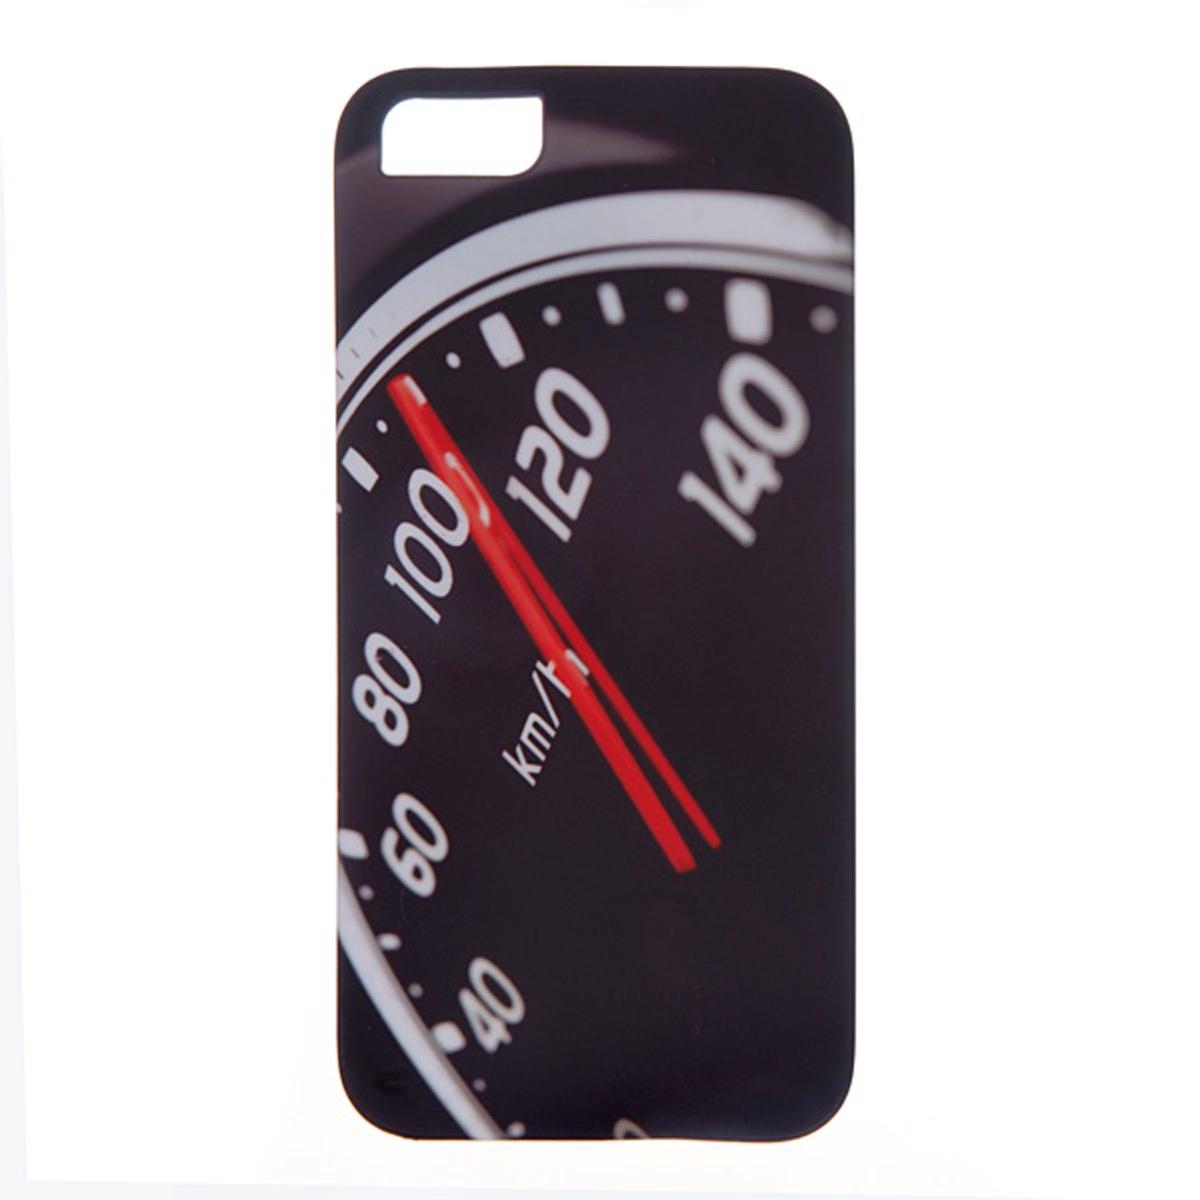 Чехол для сотового телефона Mitya Veselkov IP5.MITYA, IP5.МITYA-018 все цены